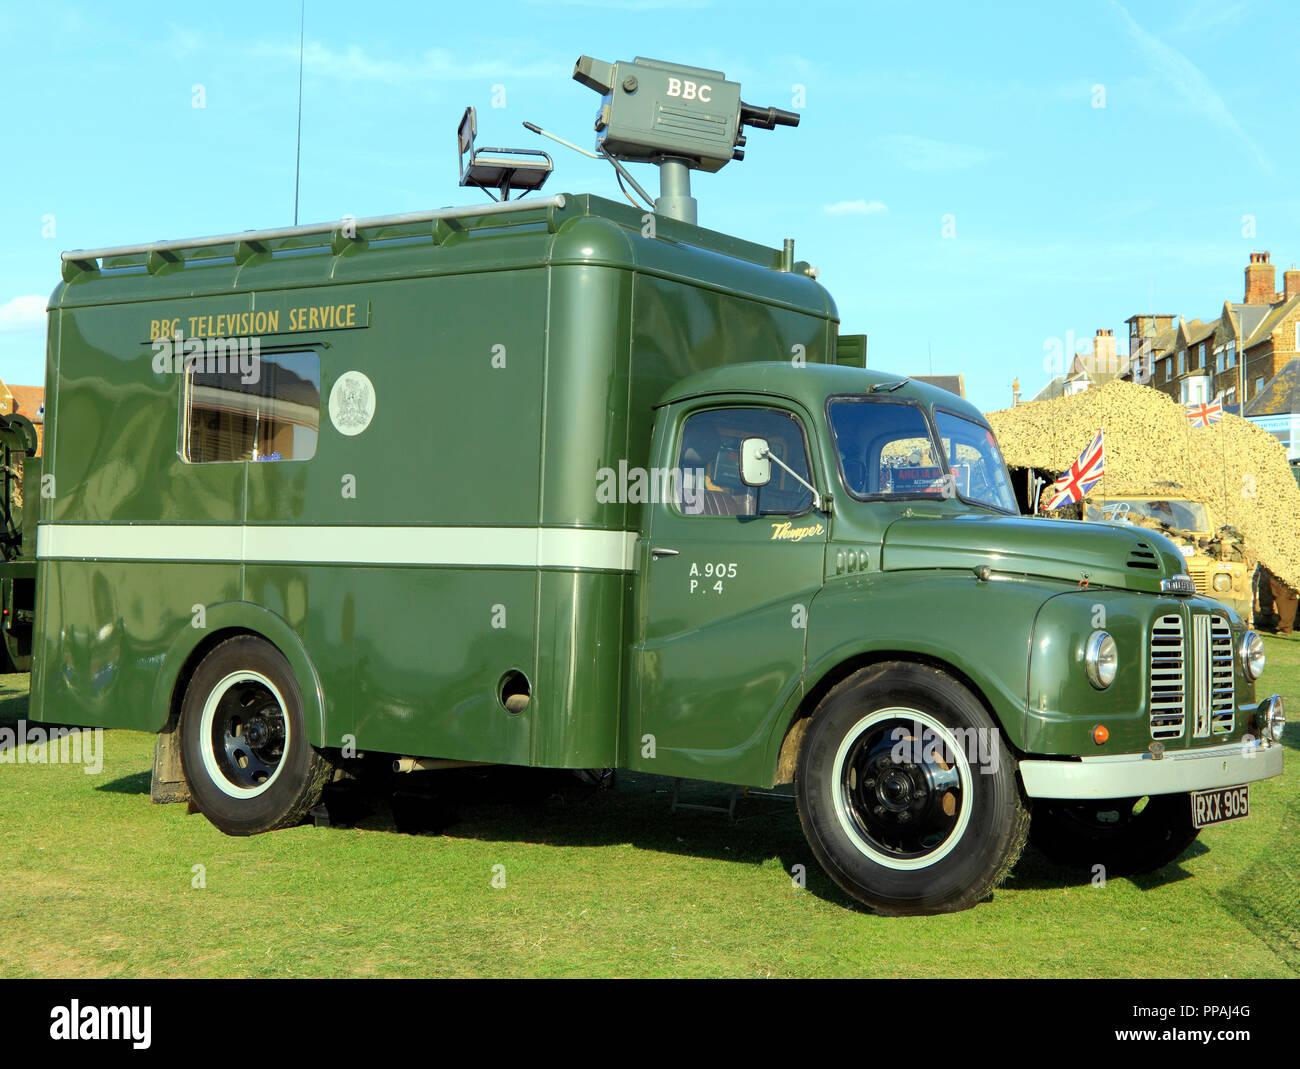 BBC Television, van, camera, outside broadcast, vintage, 1950s Stock